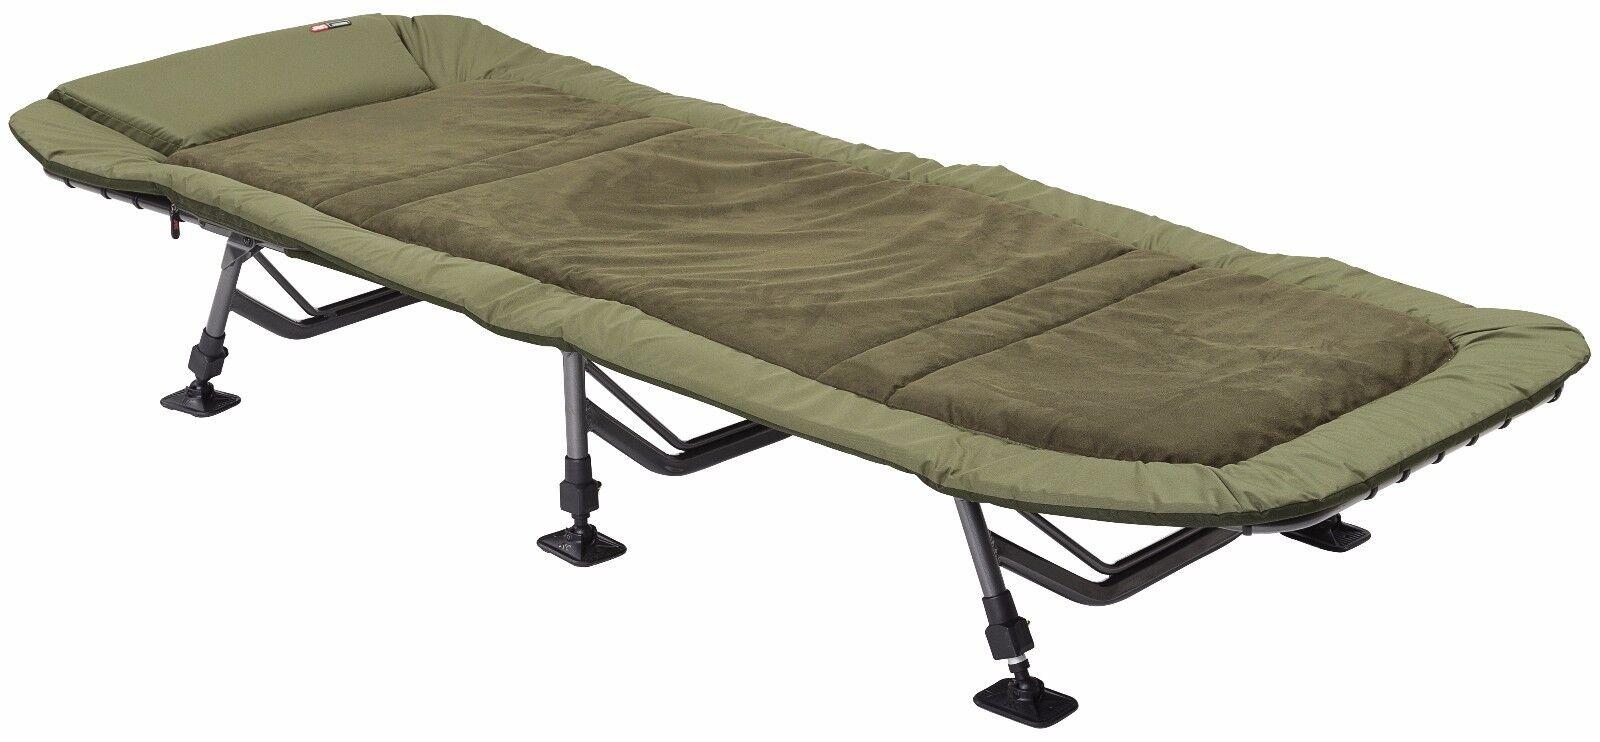 JRC Cocoon 2G Super Levelbed Fishing Bedchair + Bedchair Bag - 1411119